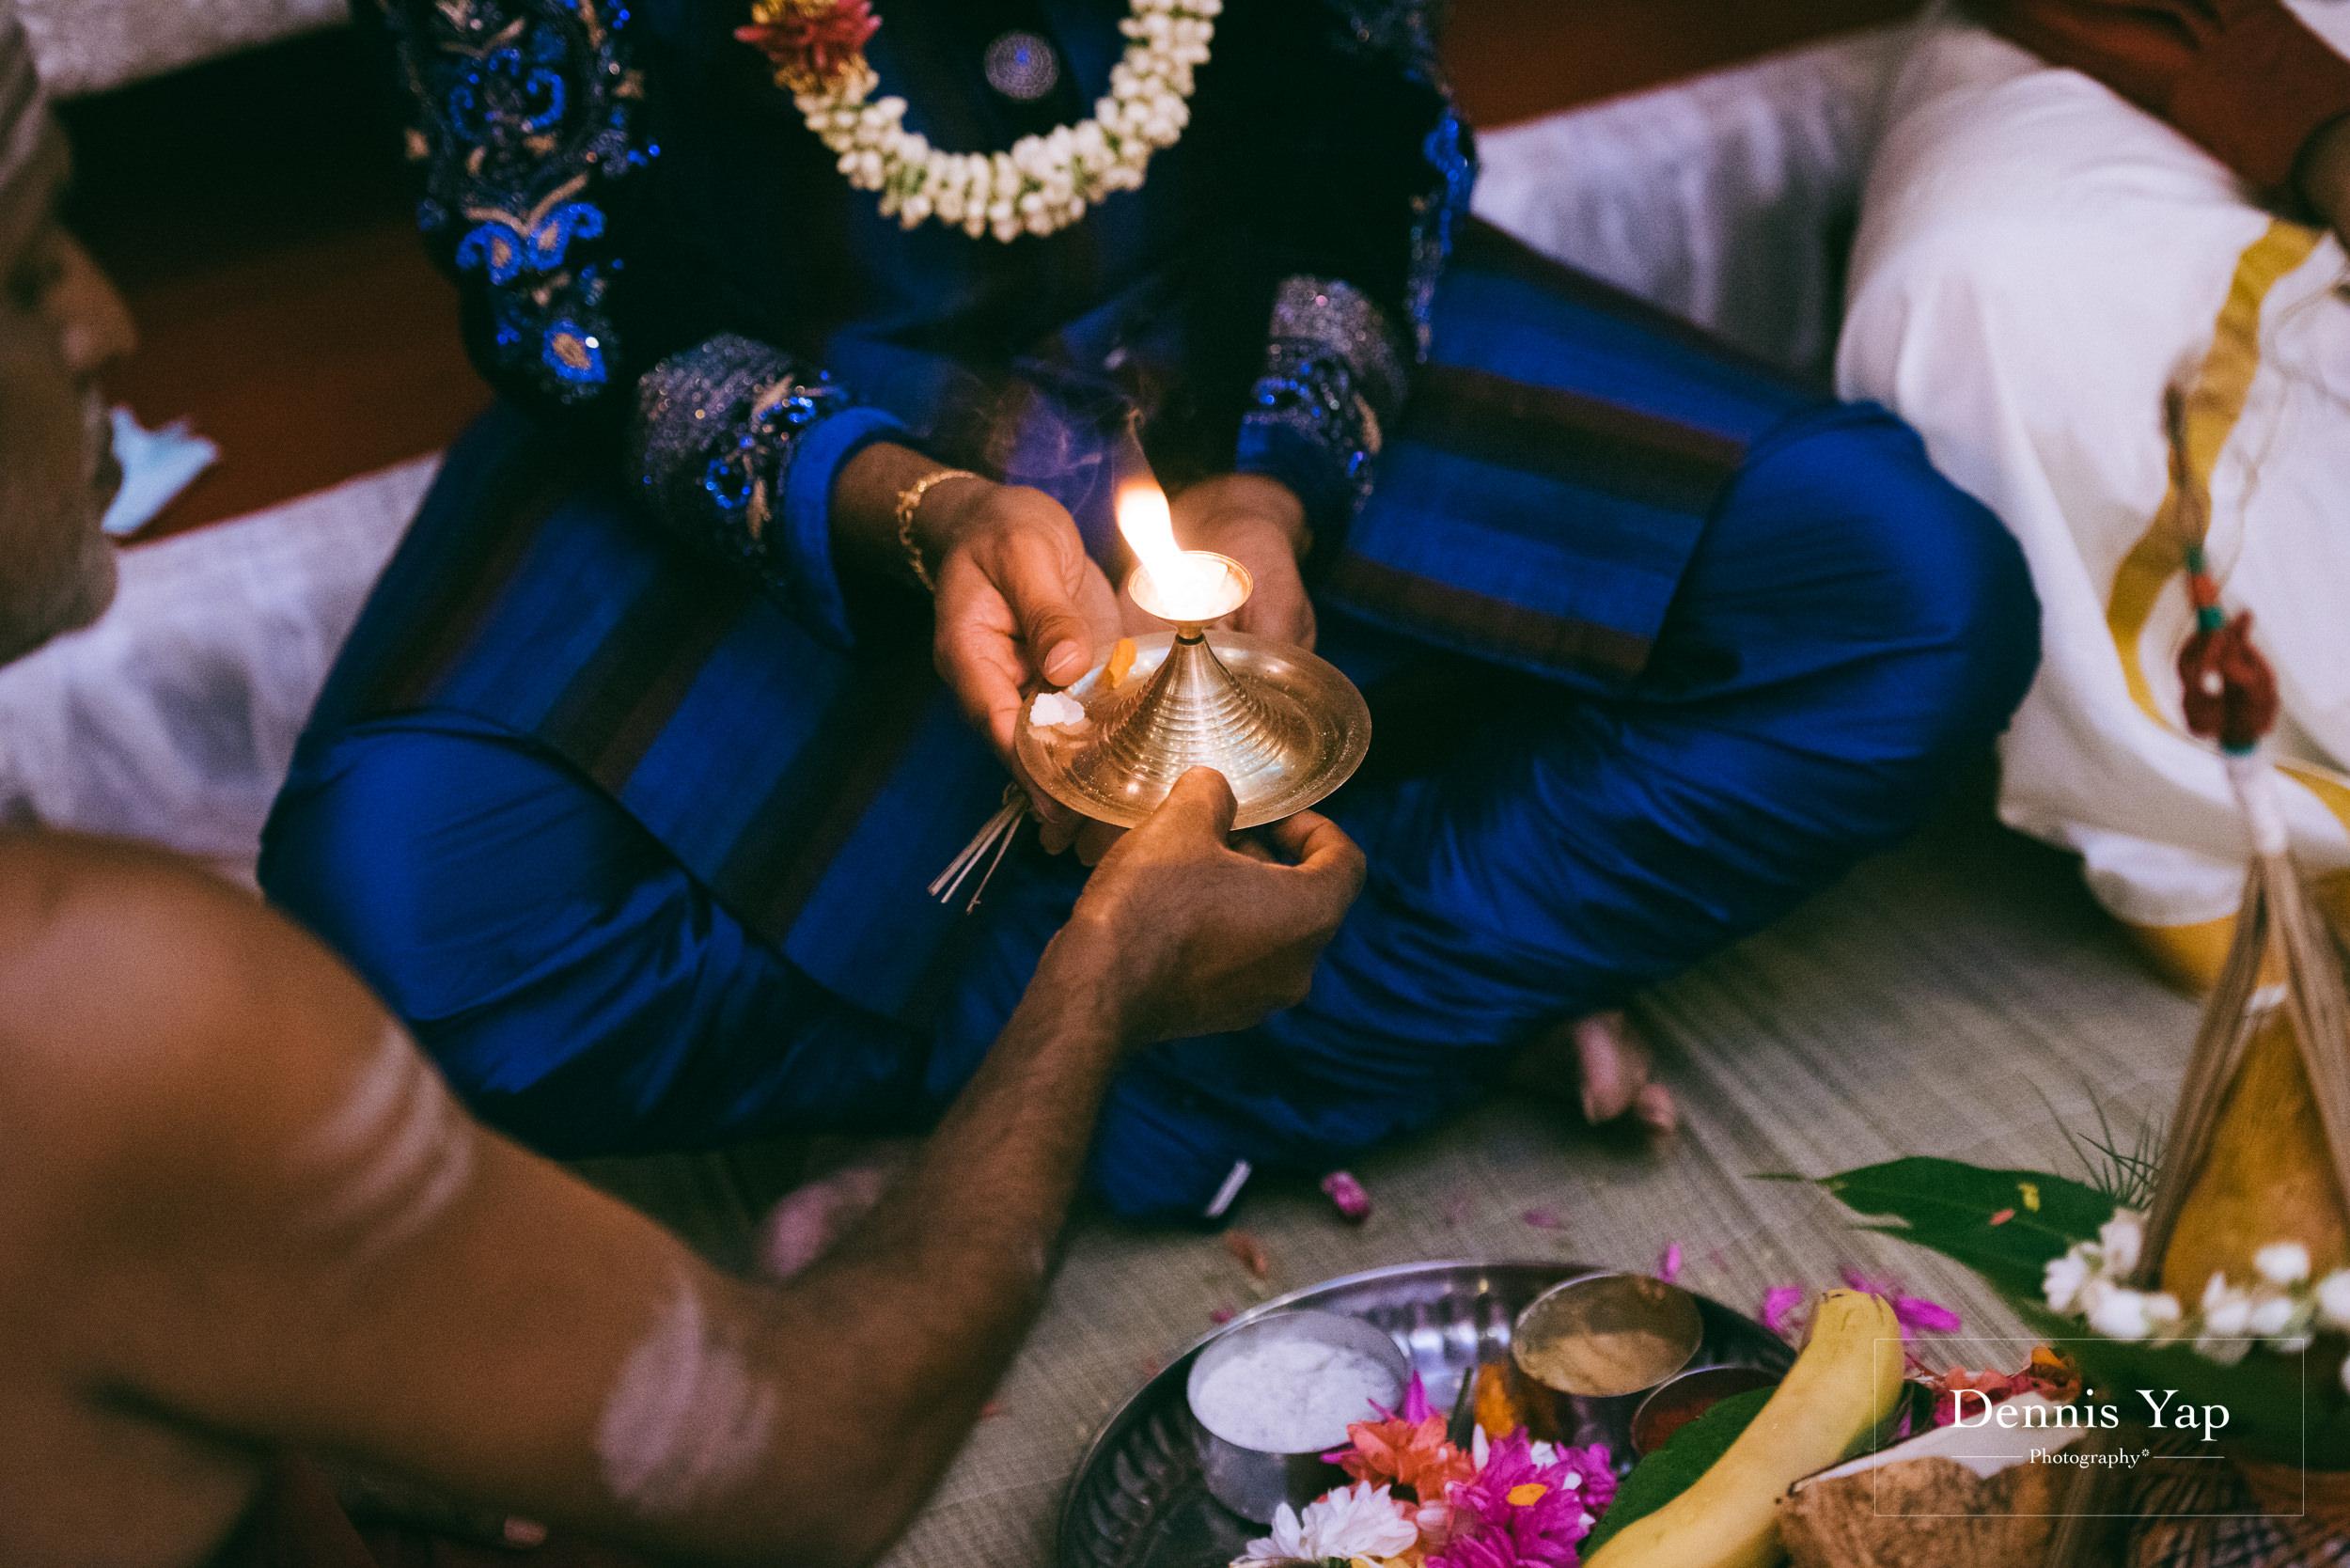 puvaneswaran cangitaa indian wedding ceremony ideal convention dennis yap photography malaysia-10.jpg